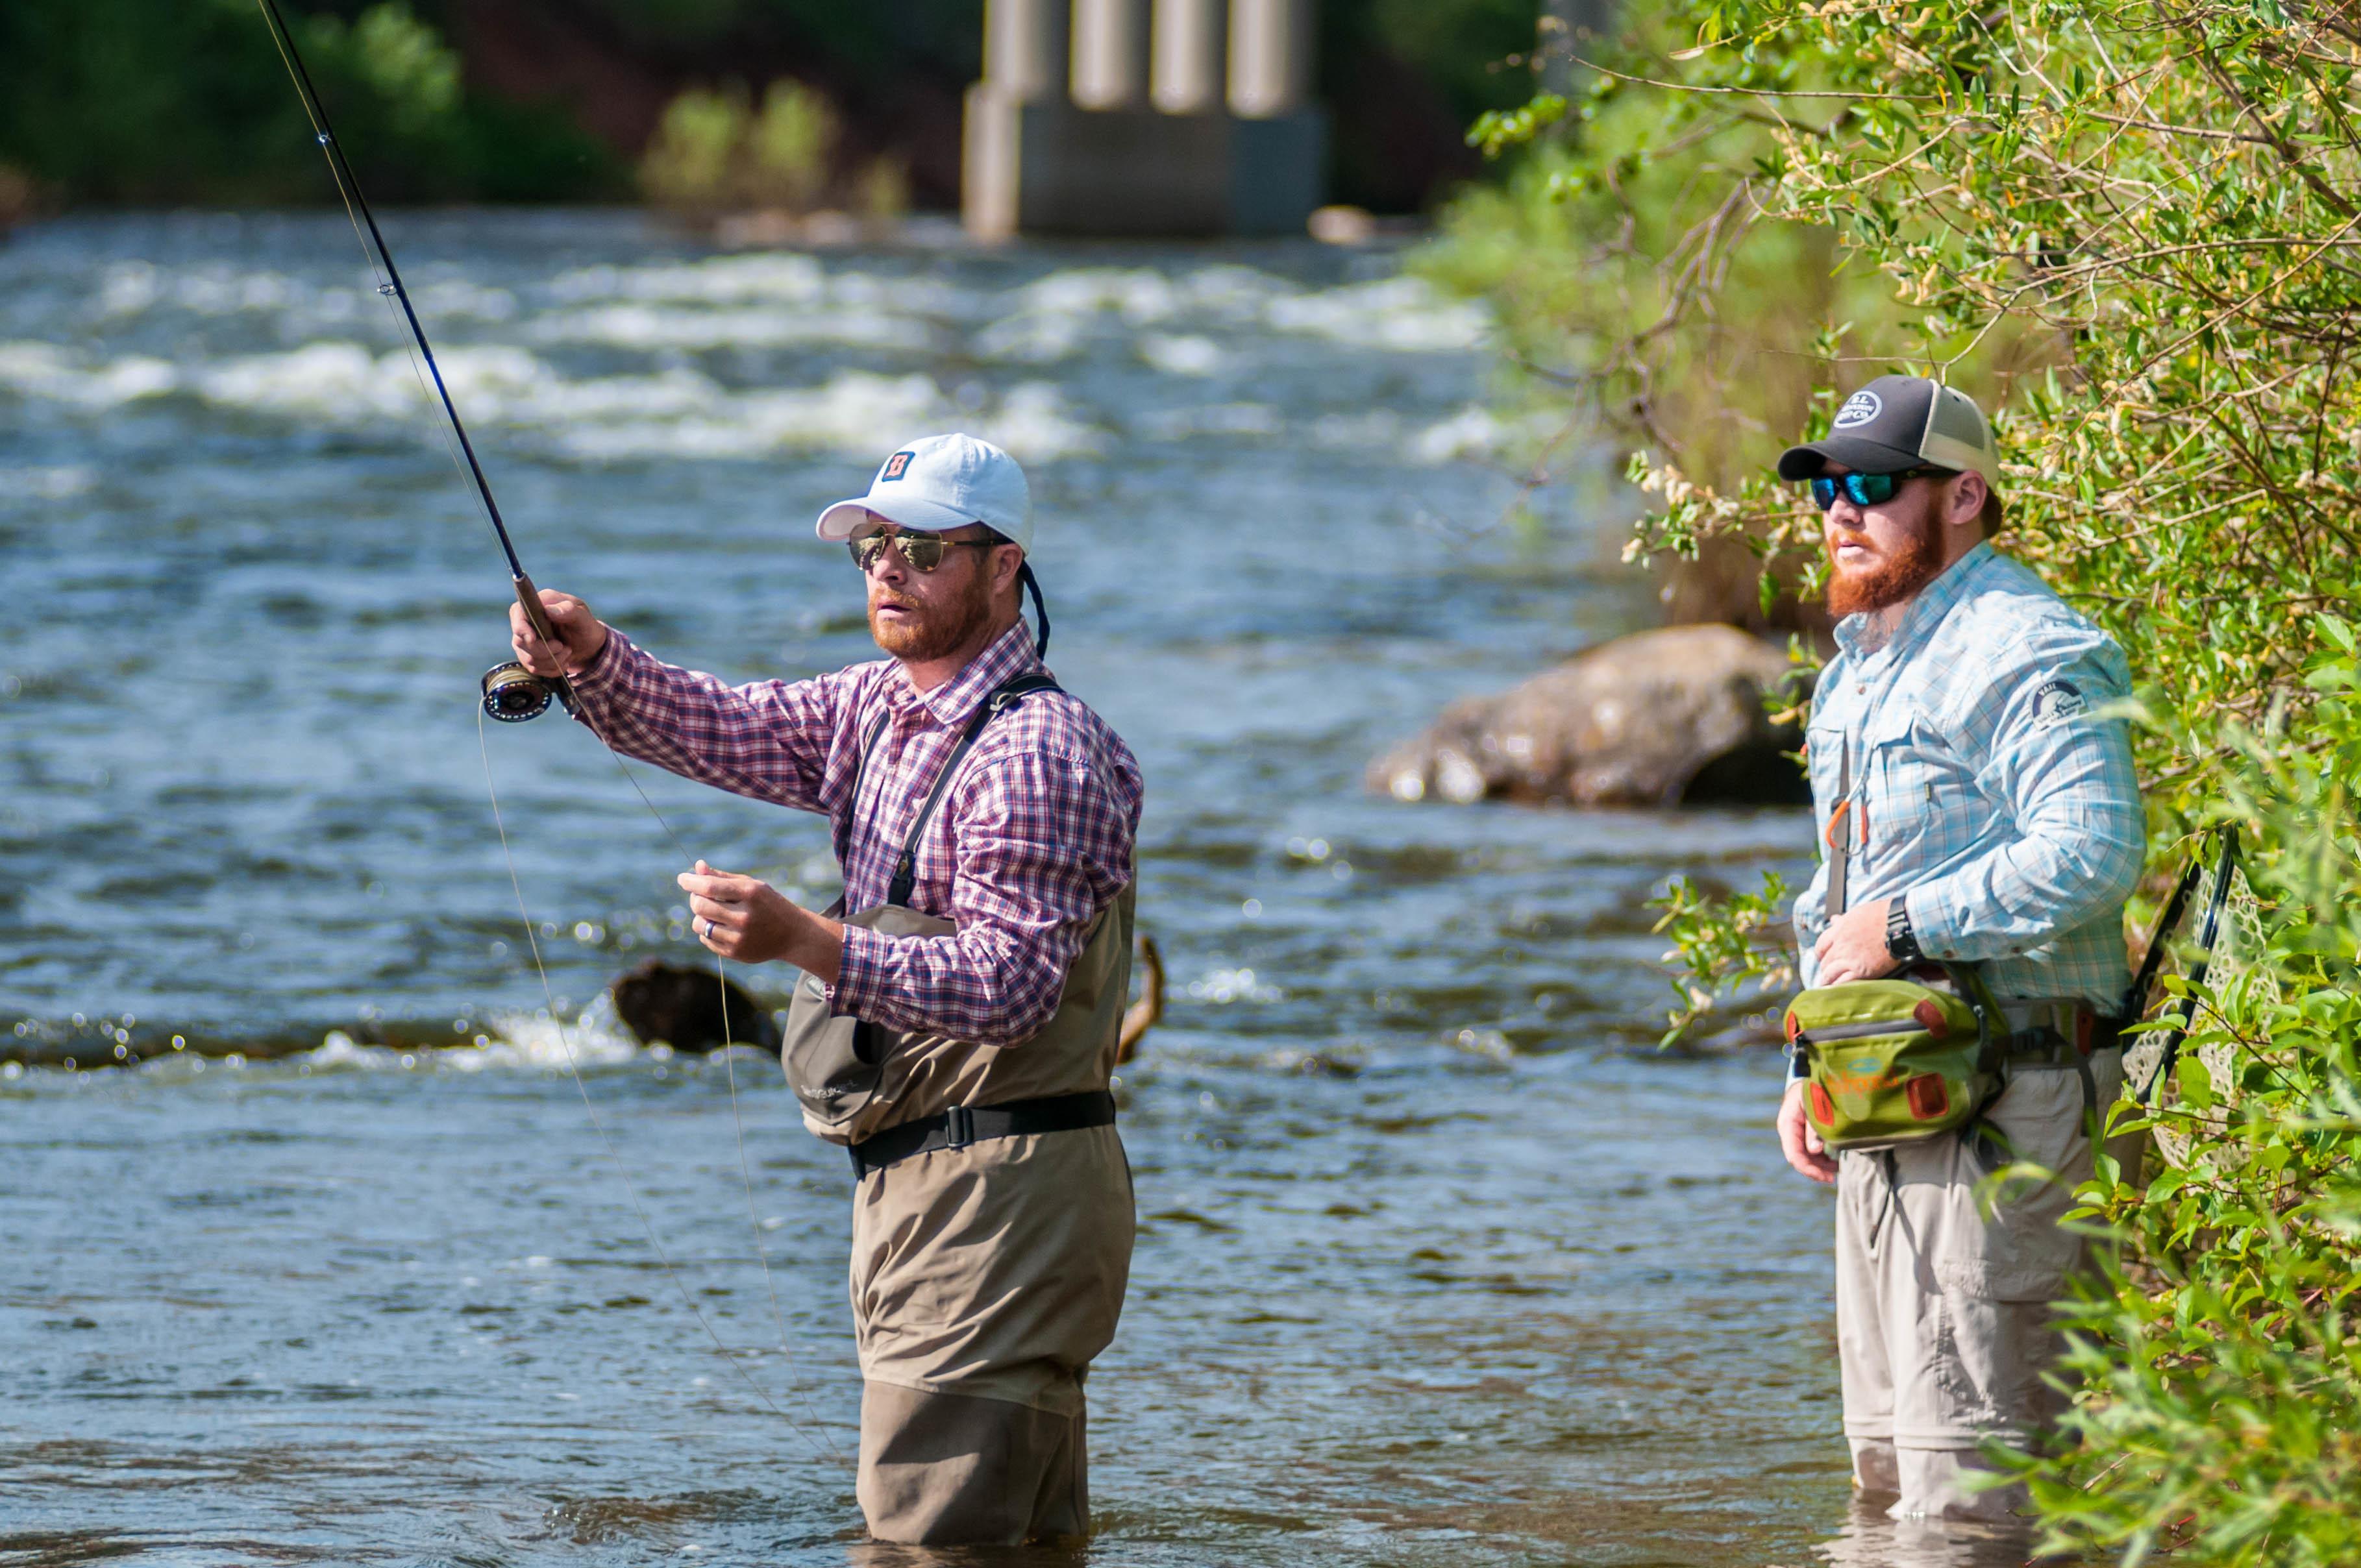 Vail Valley Anglers: Bike & Fish